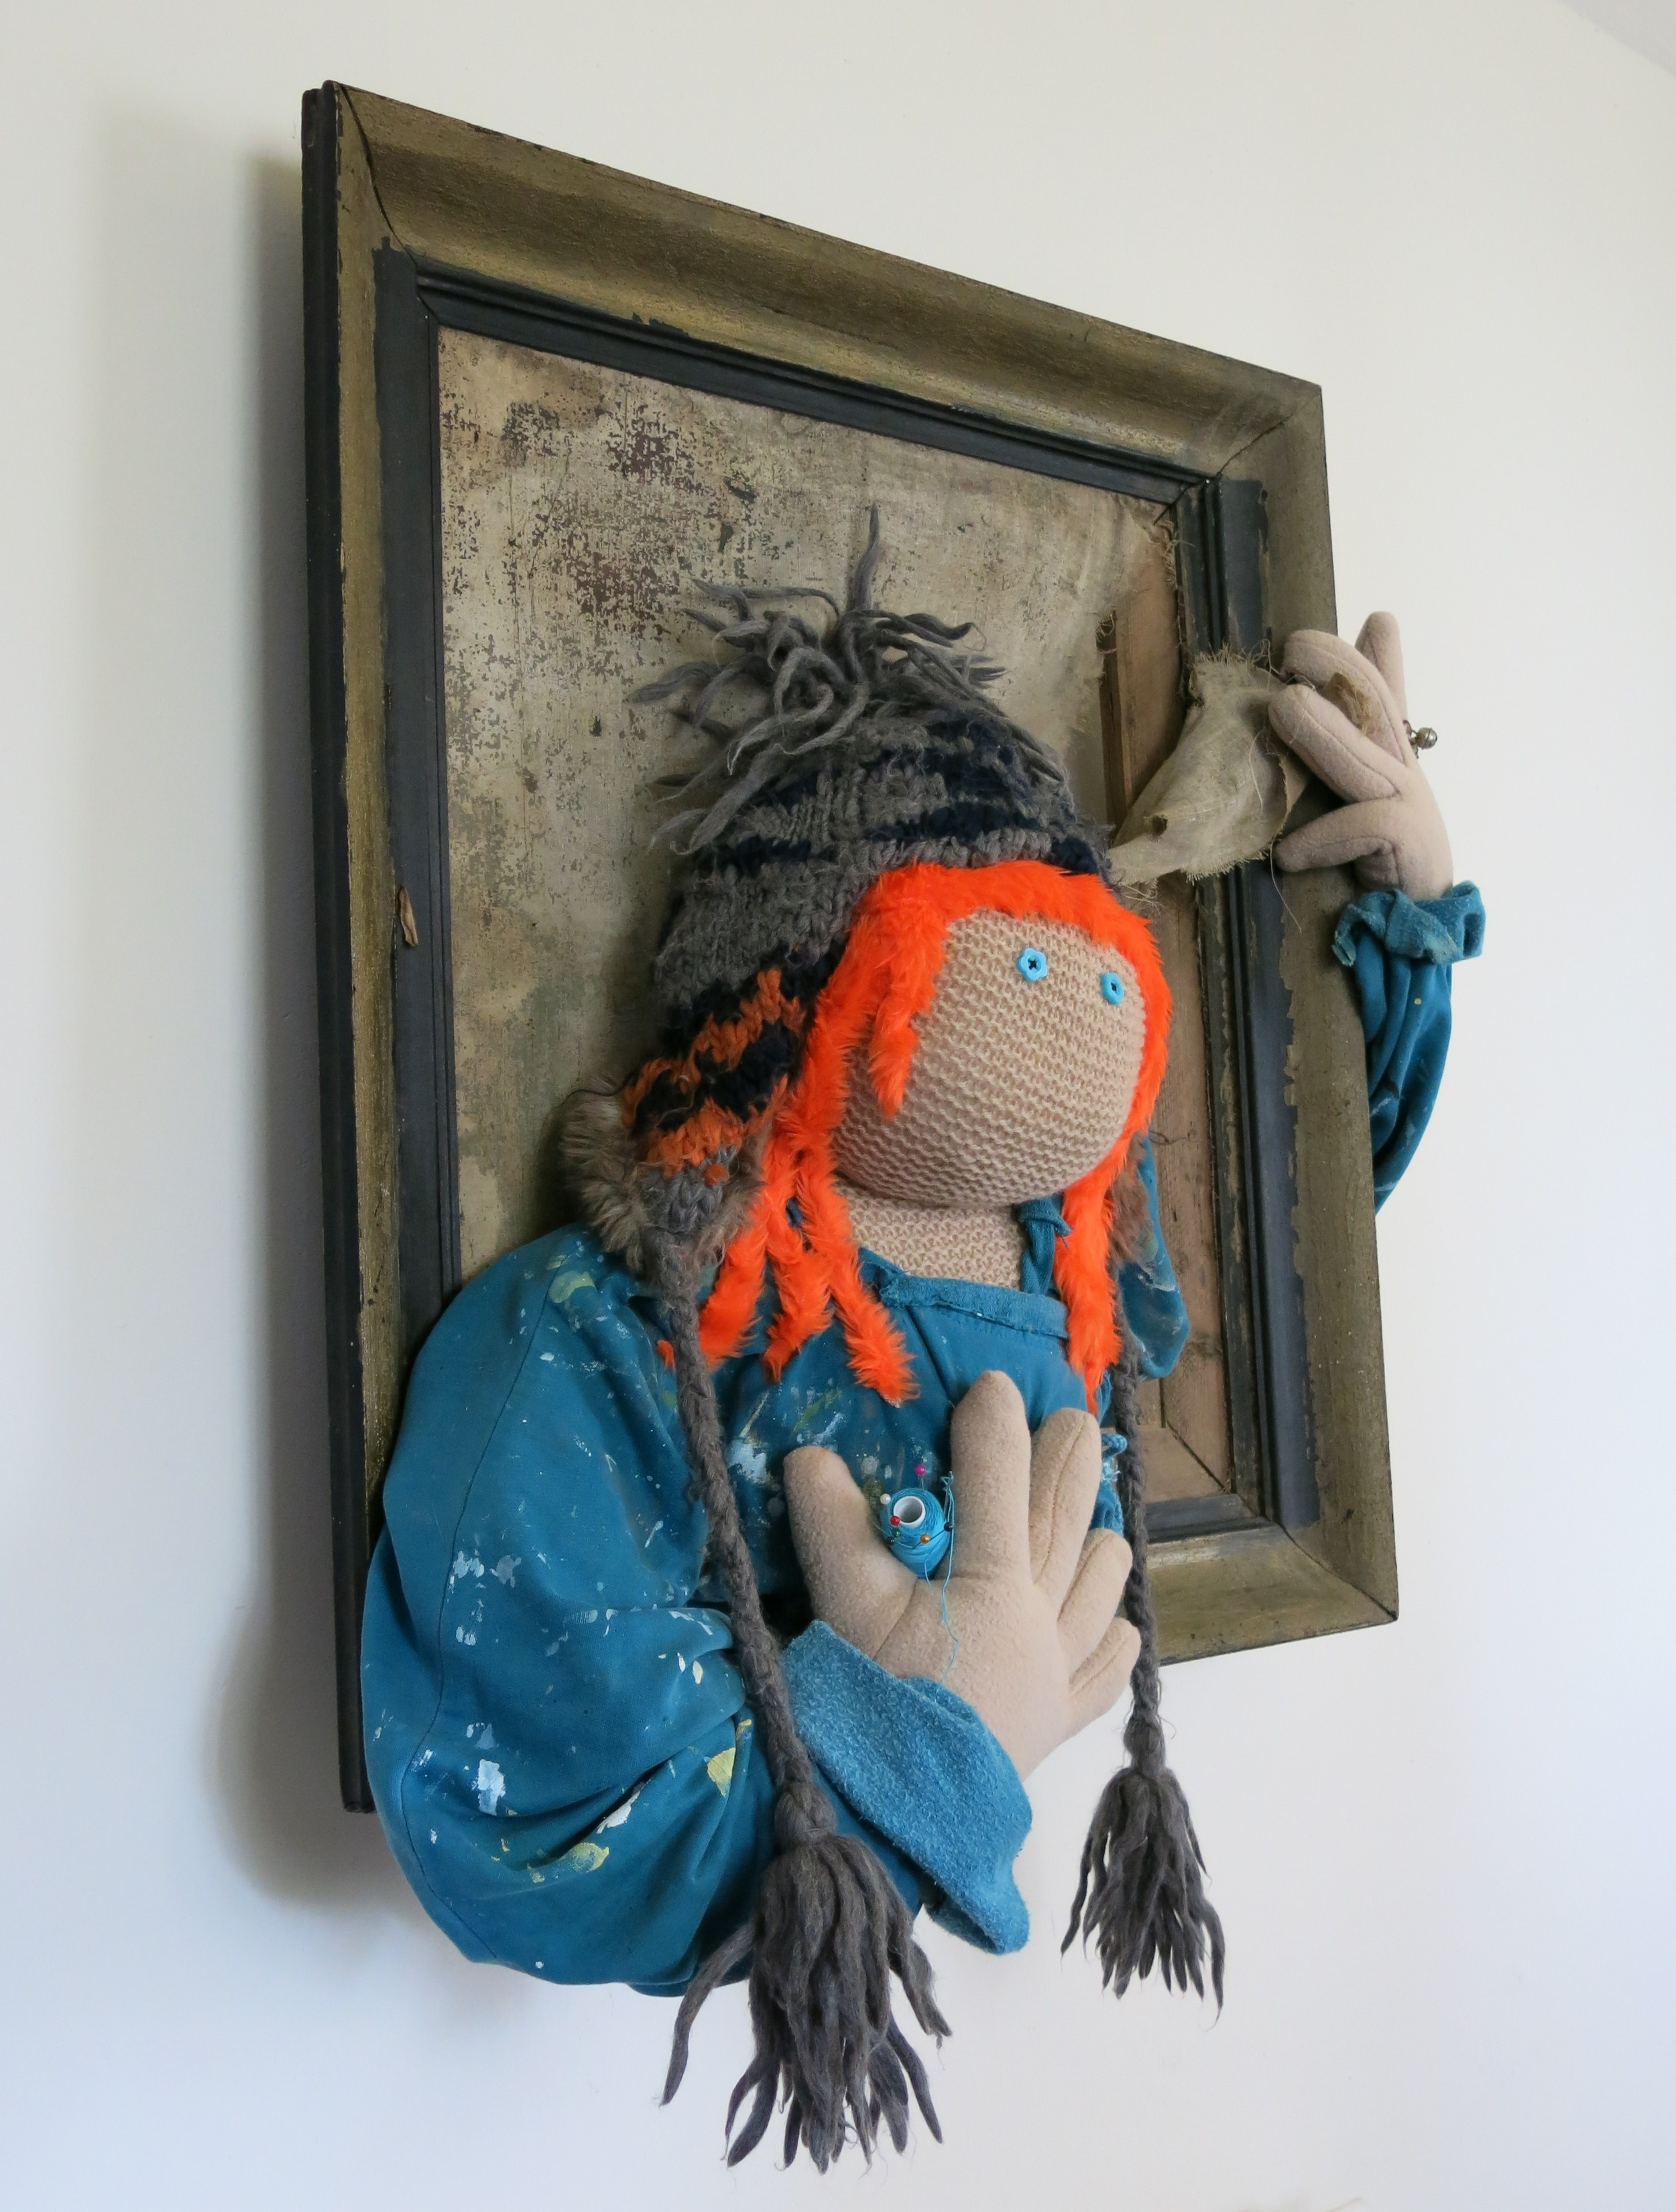 Traci Moss - Sticking Out (An Autobiographical Peek) - alternative view #1.JPG